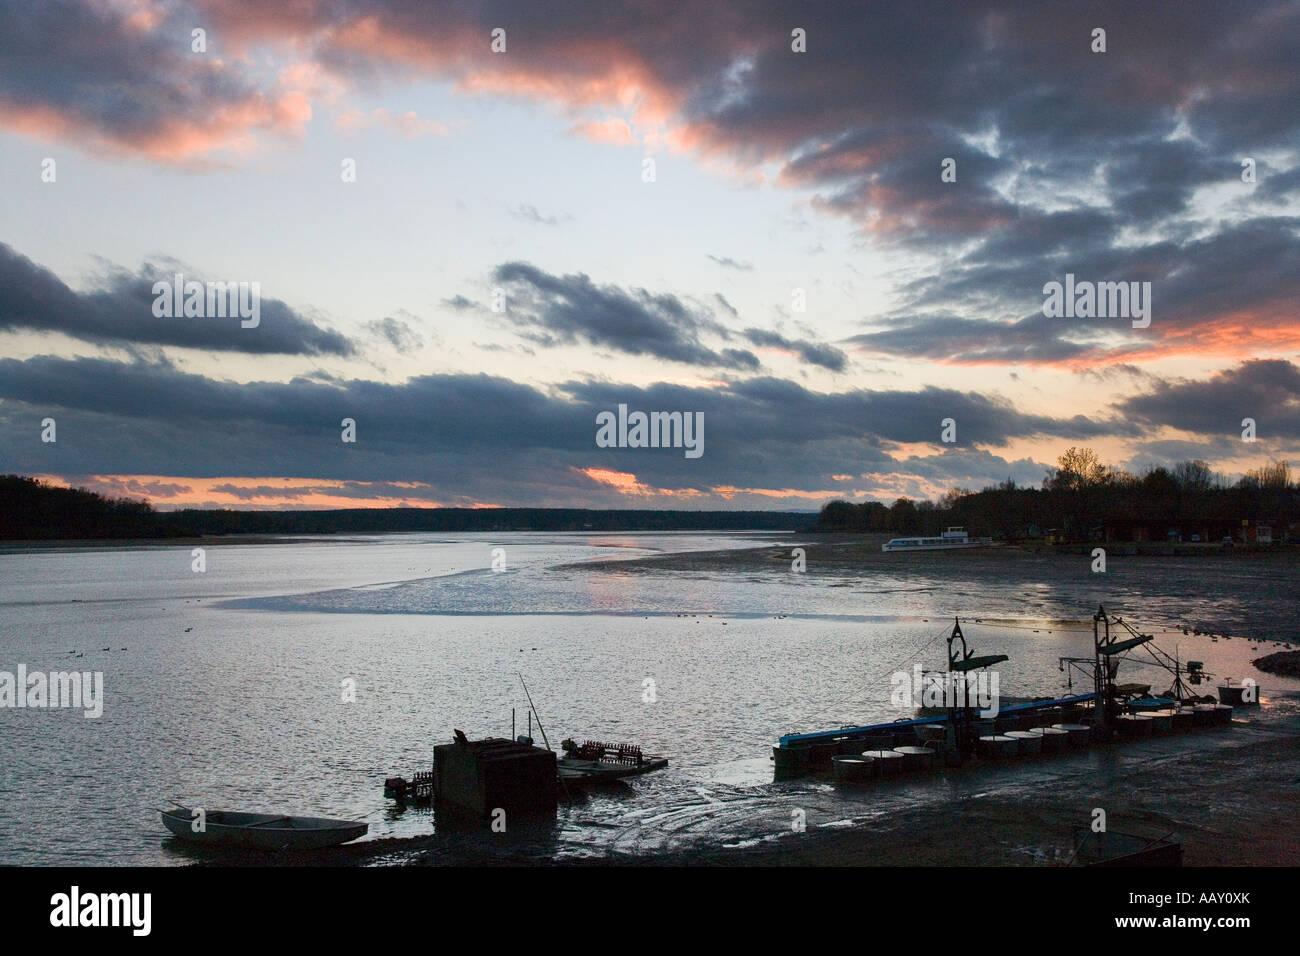 Rybnik Svet Trebon Jizni Cechy Ceska Republika Stock Photo